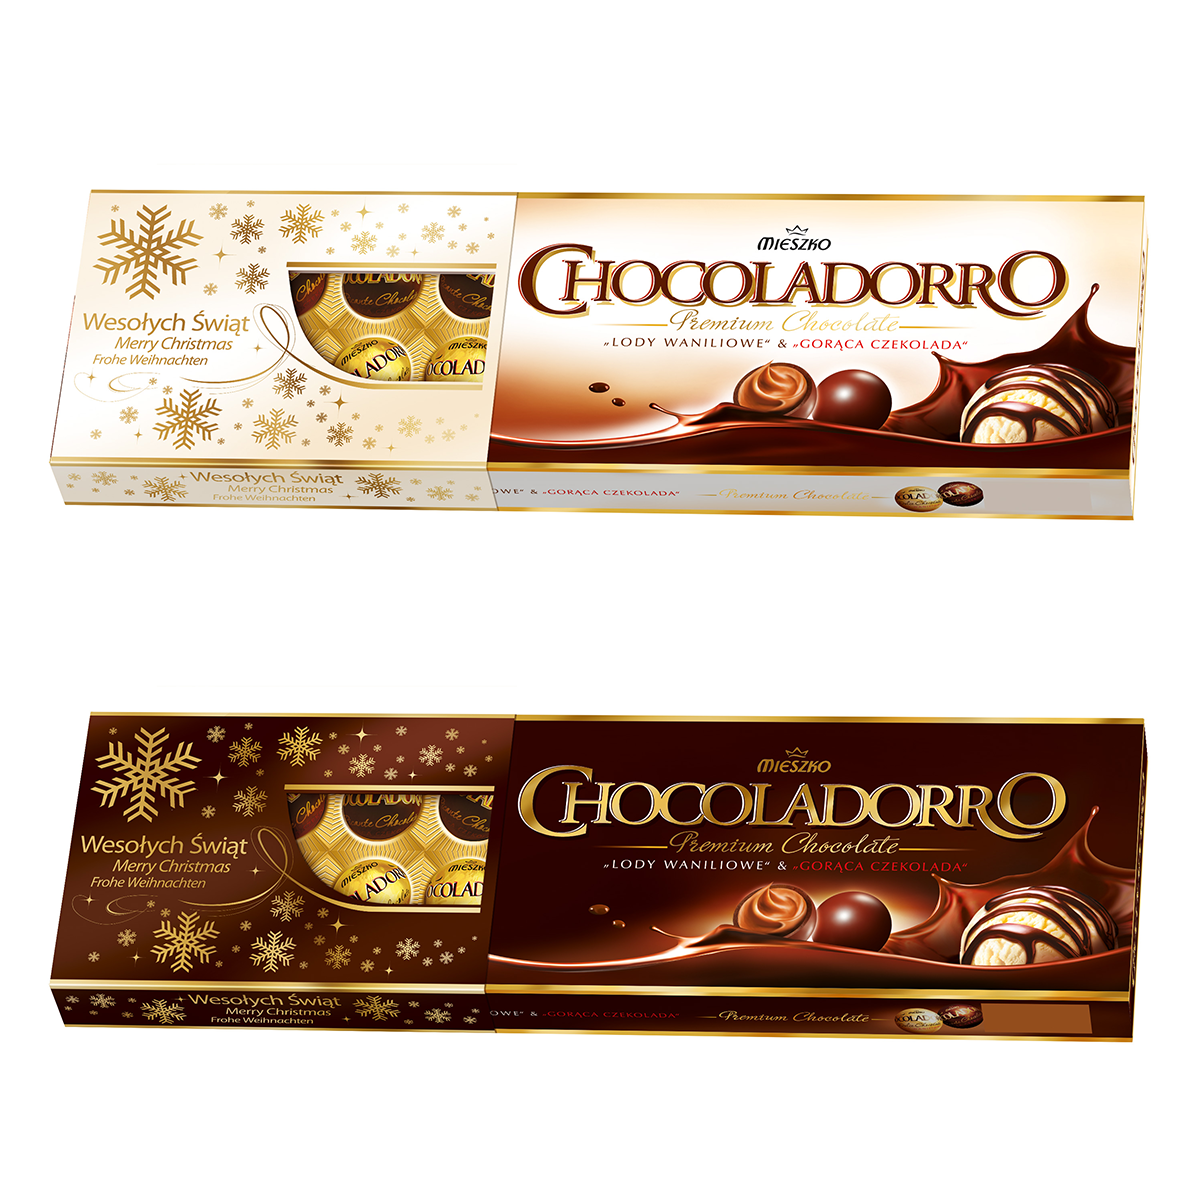 2020_09_02_chocoladorro_6